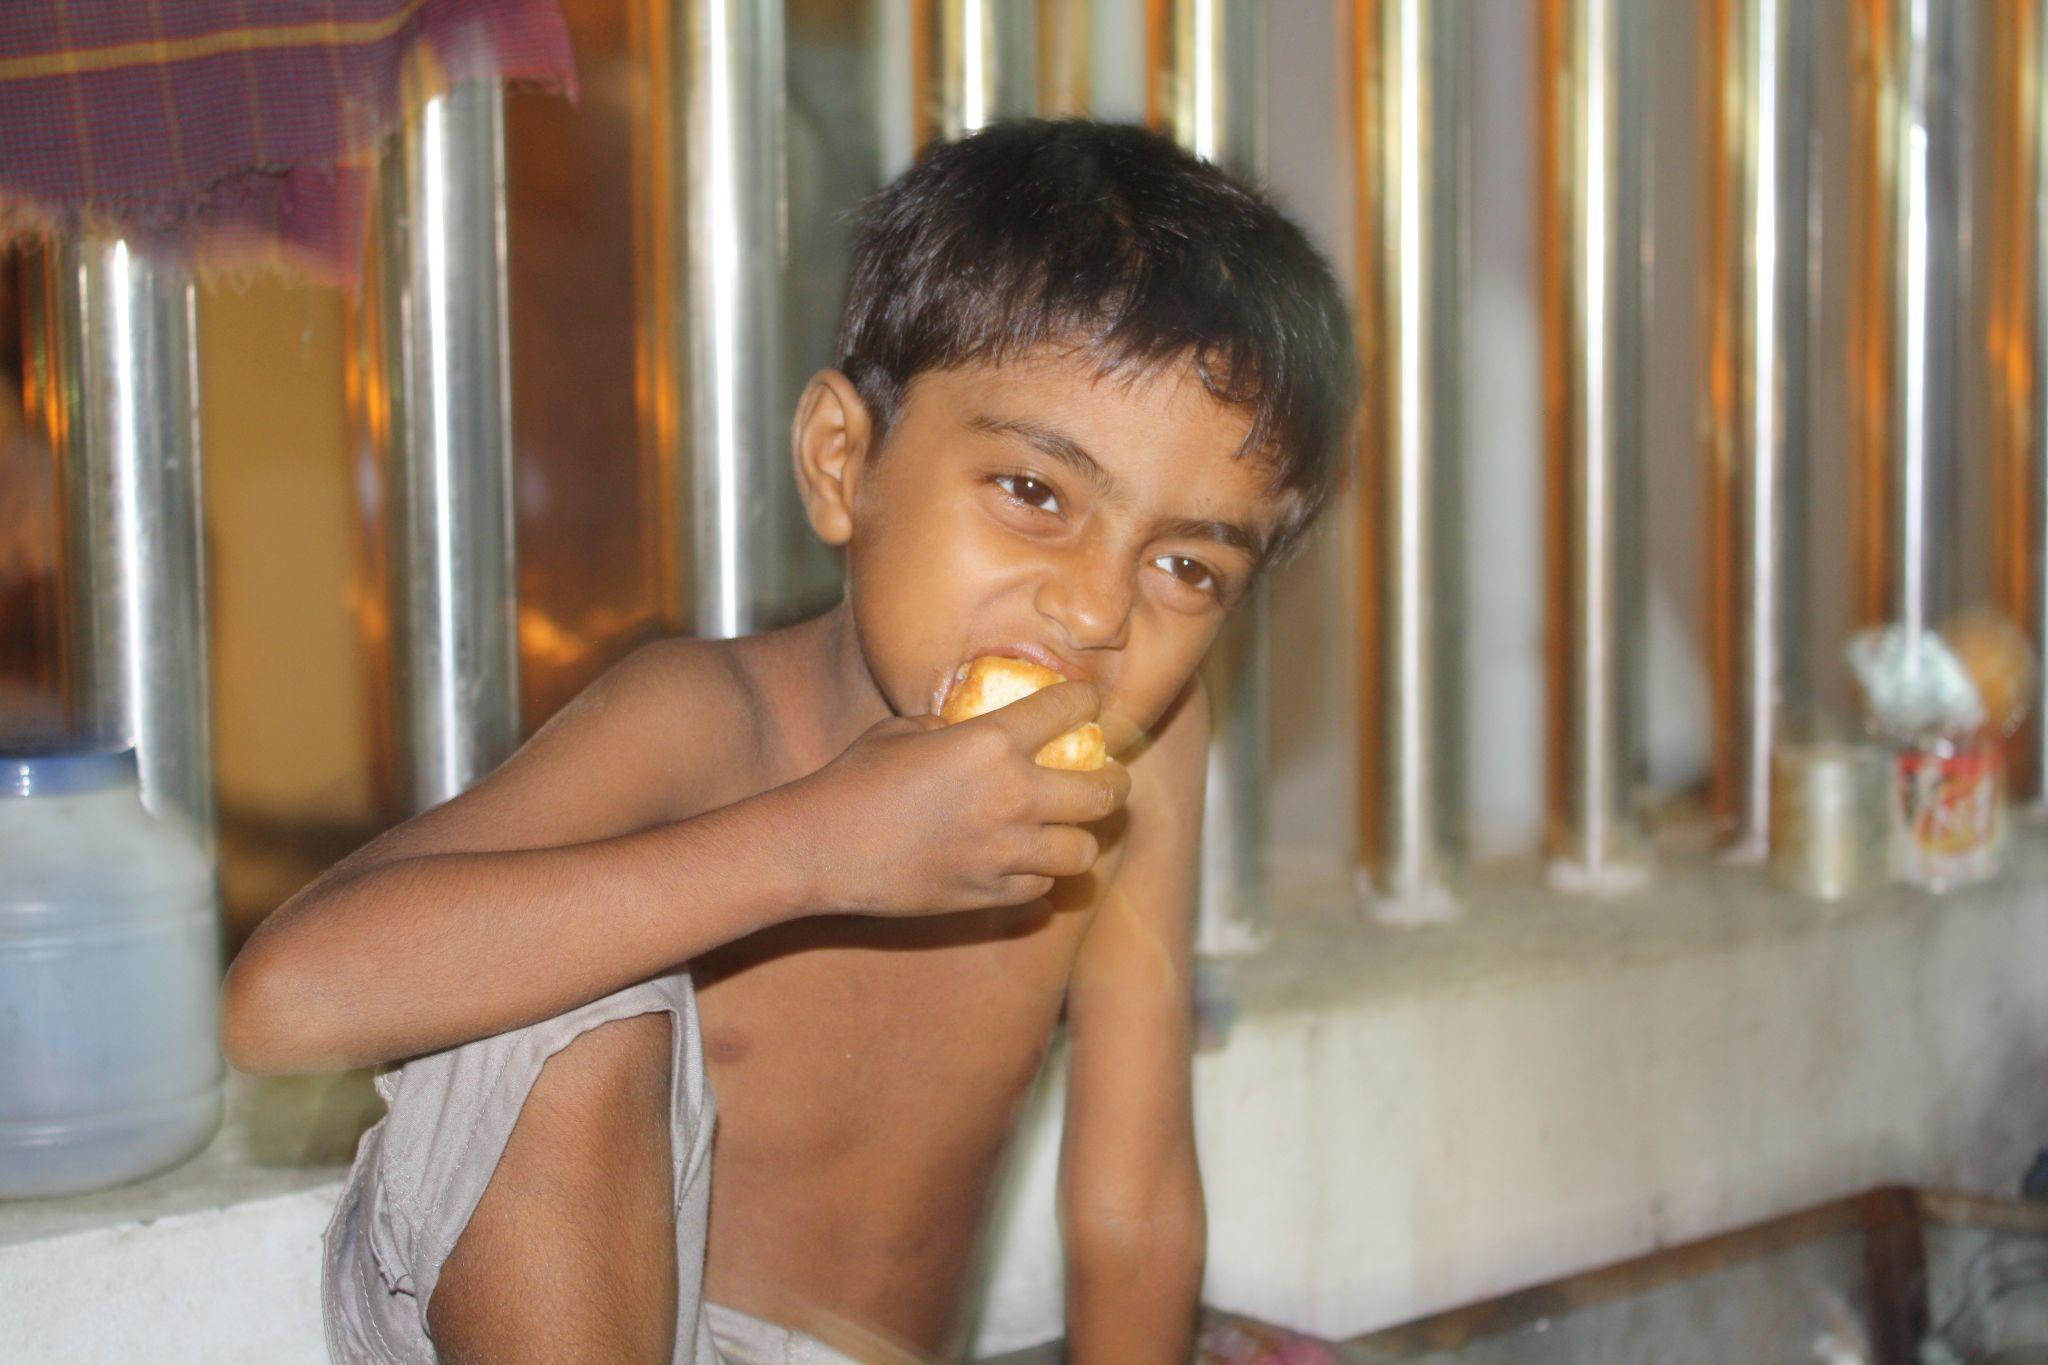 Child by kingamit1992